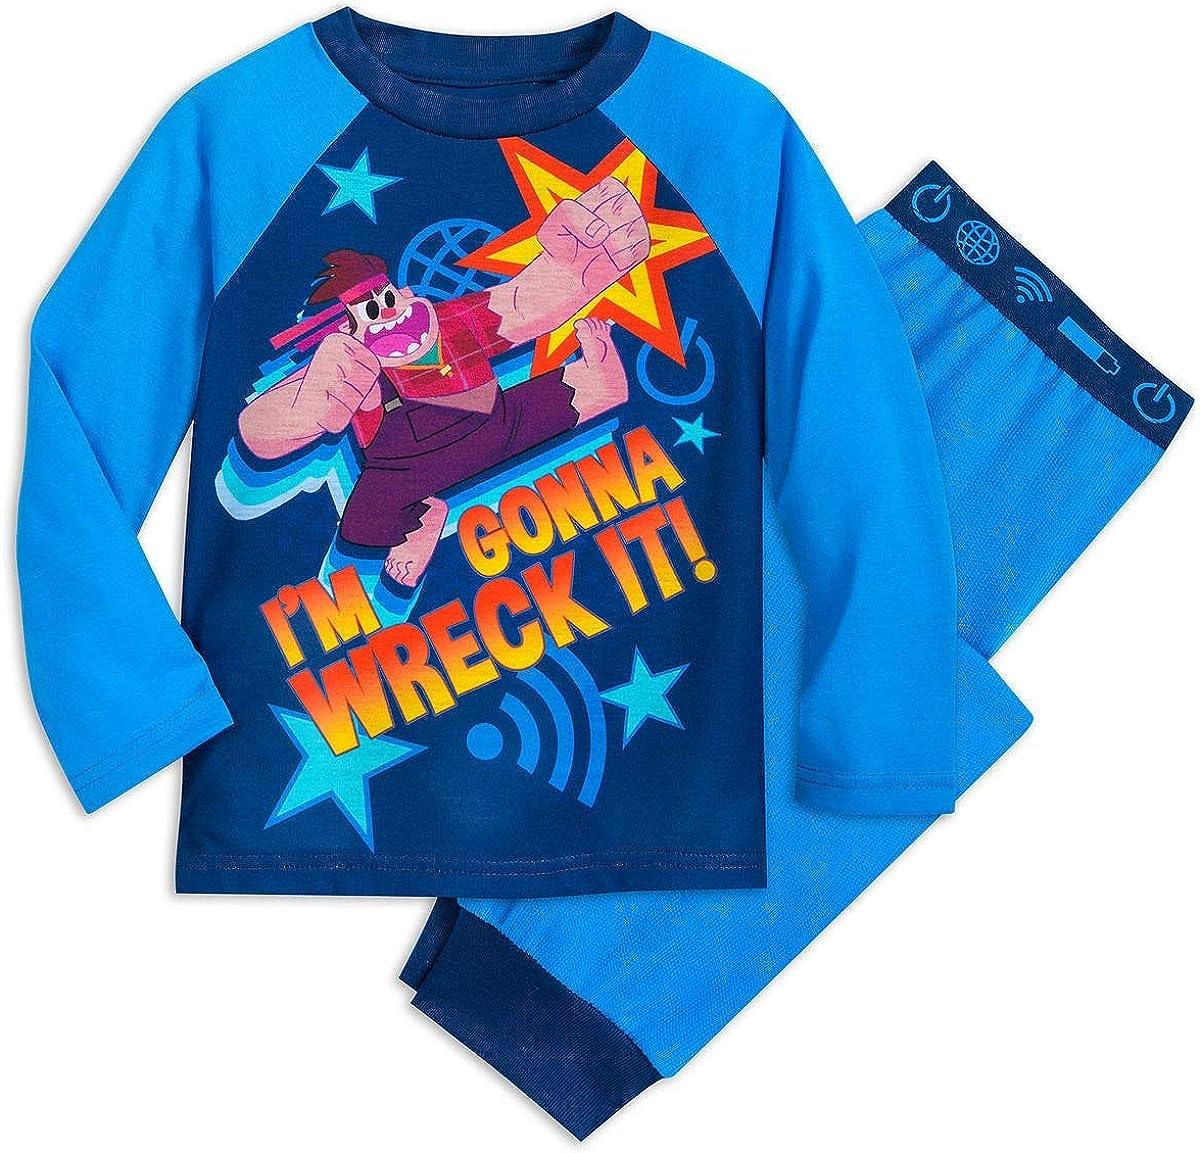 Shop Disney Wreck-It Ralph Pajama Set for Kids (7/8)